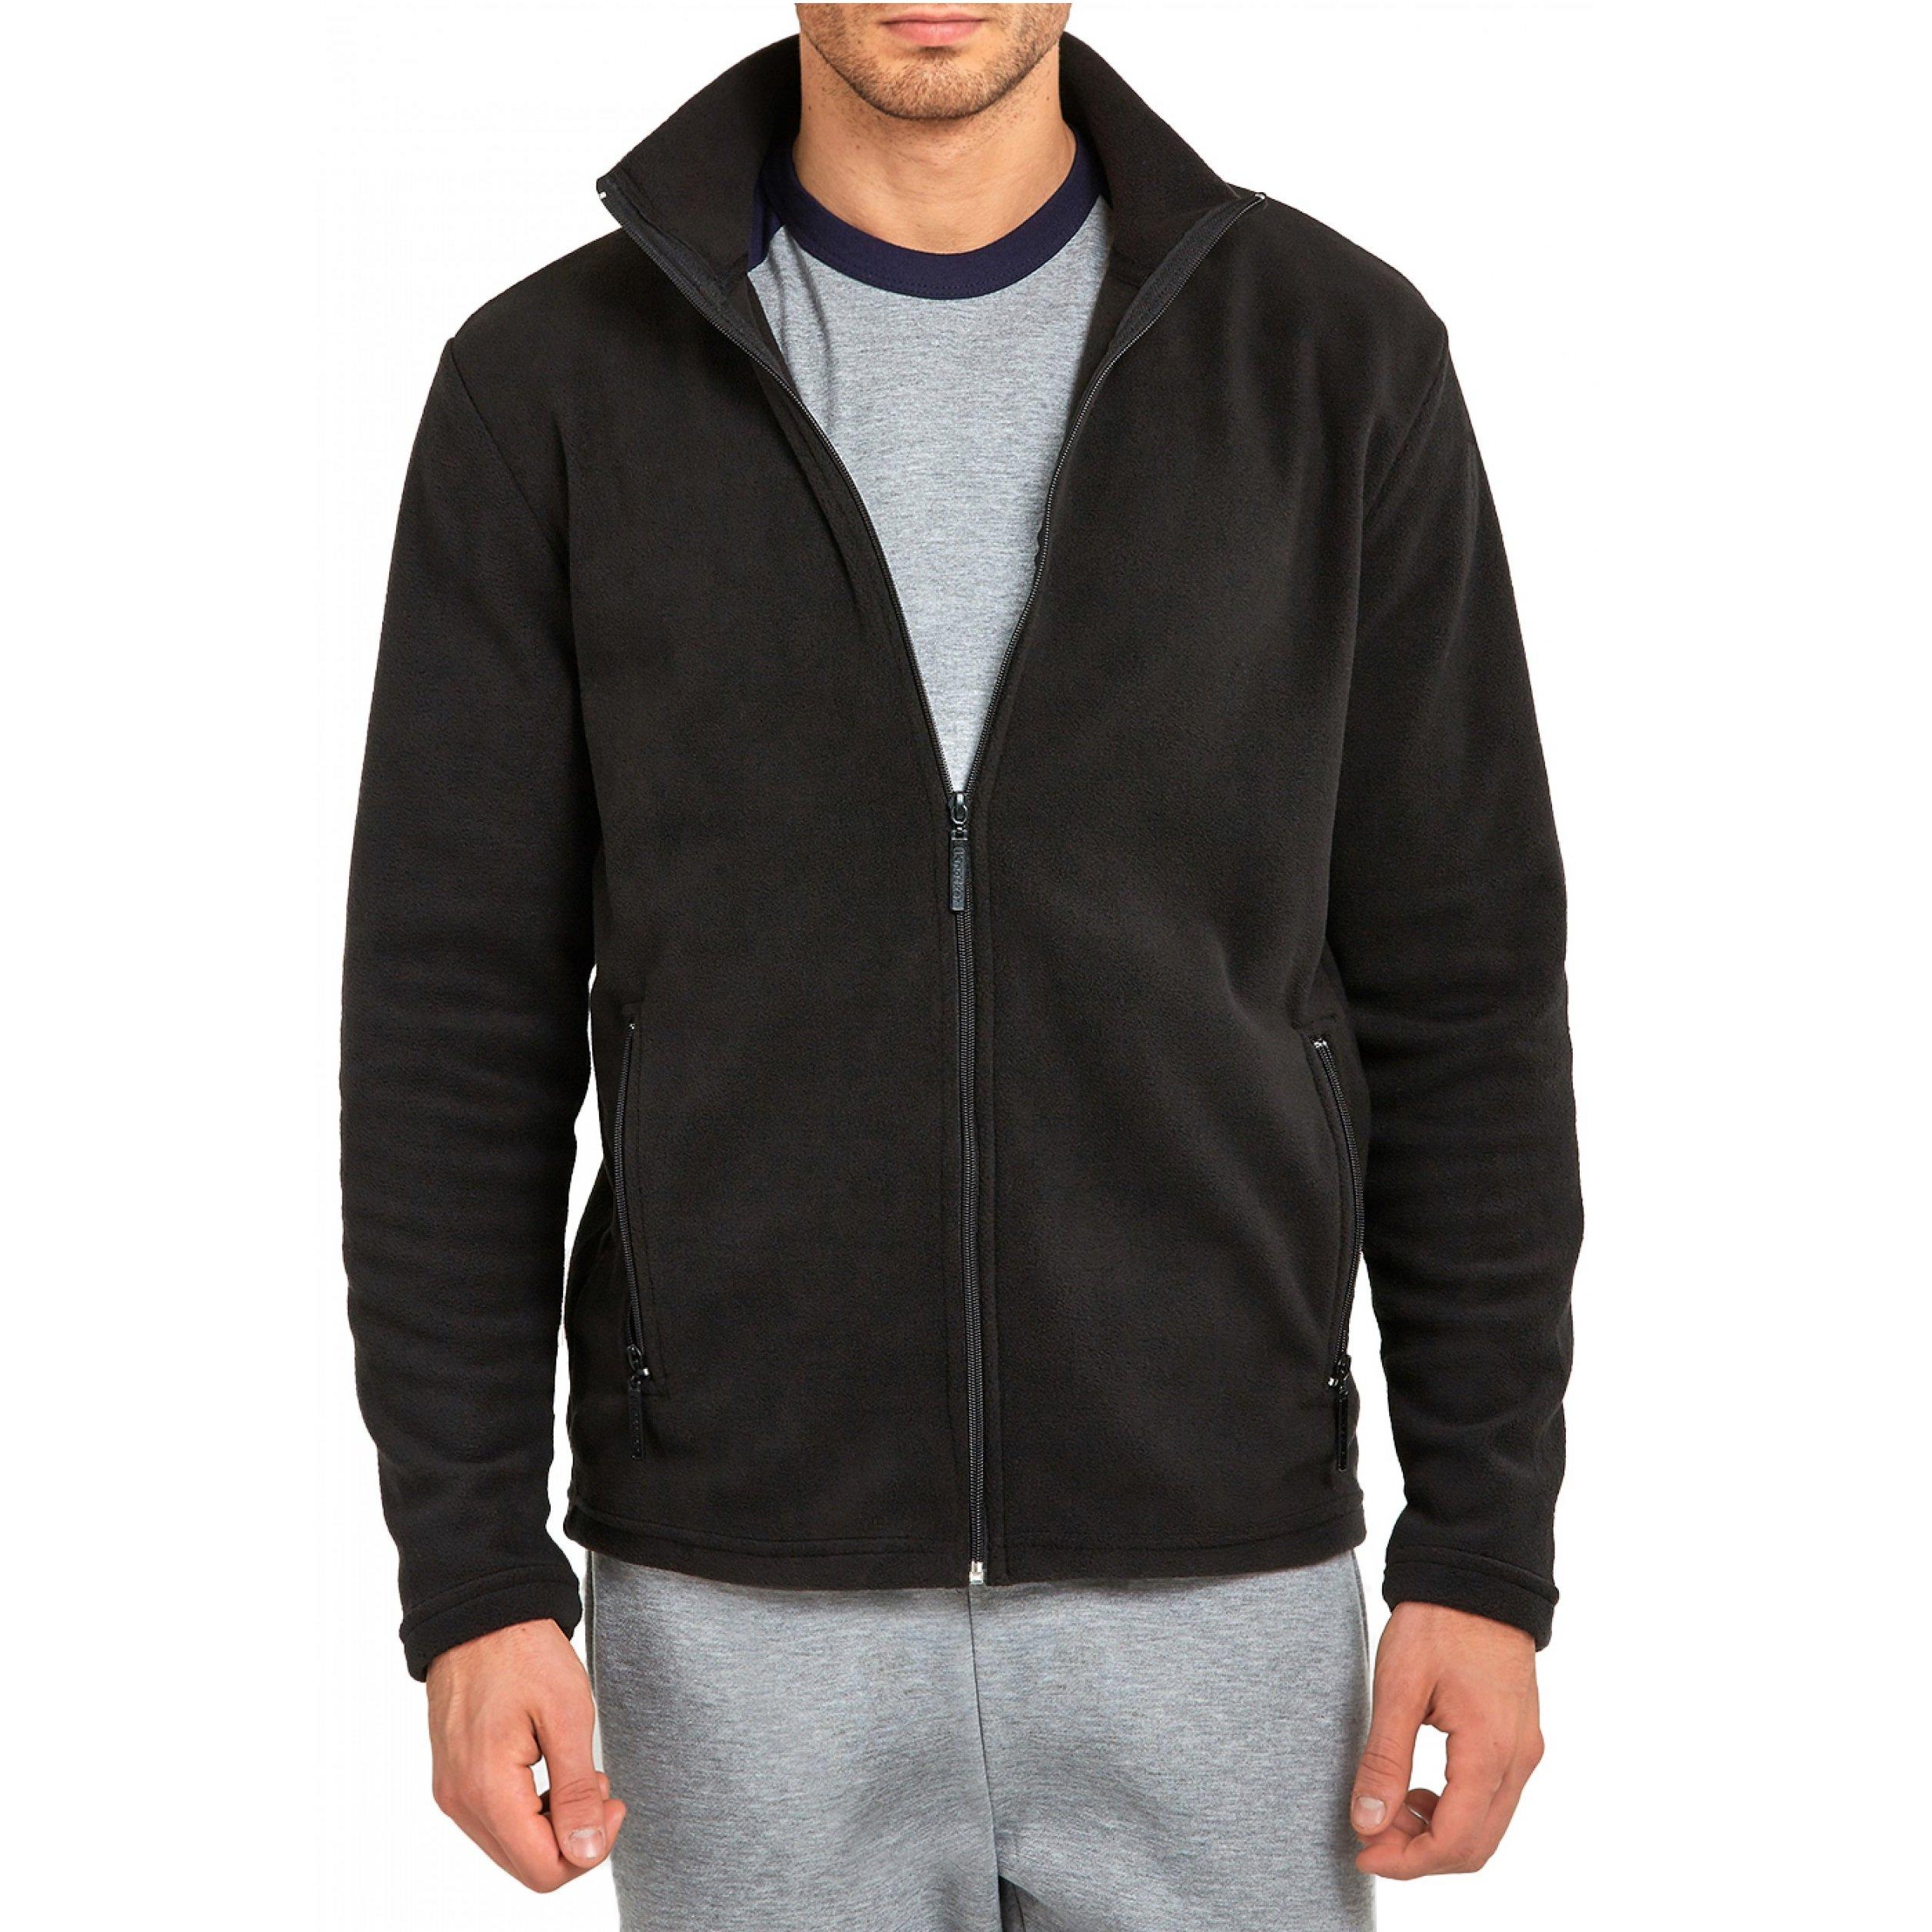 Mechaly Men Classic Full Zip Long Sleeve Polyester Polar Fleece Jacket (Black, XLarge)